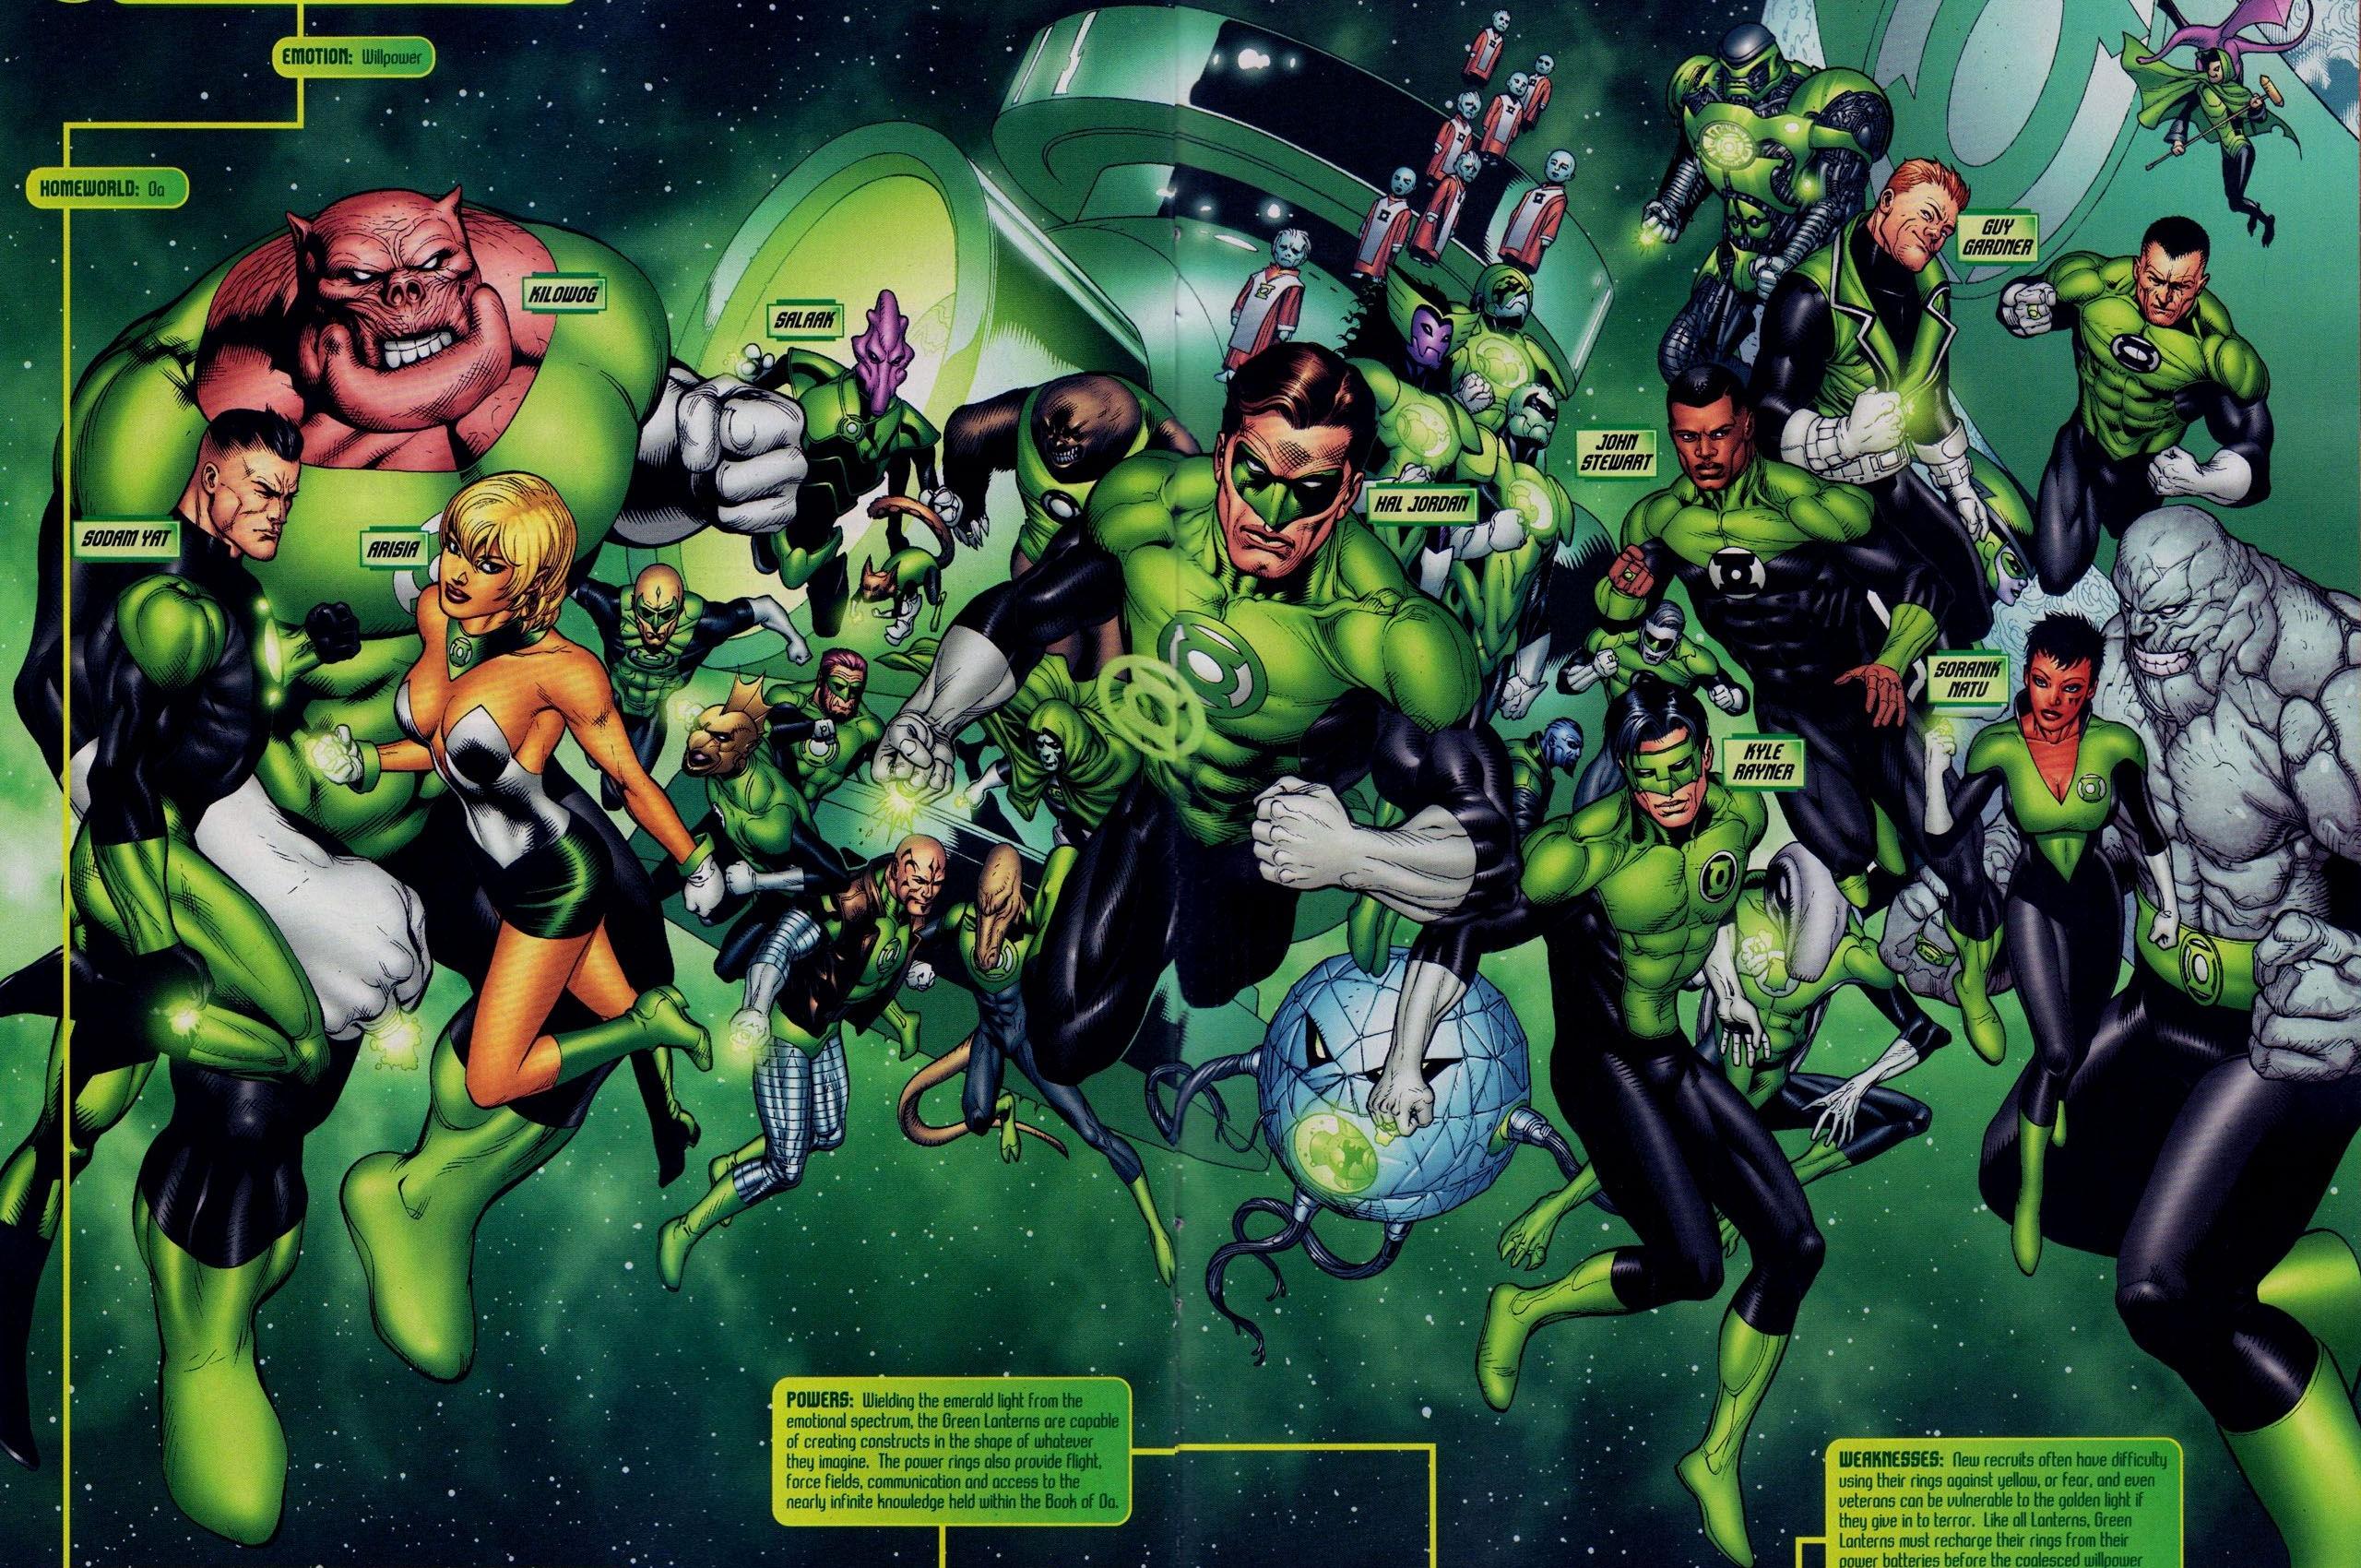 download Green Lantern Corps Wallpapers Top Green Lantern 2560x1700